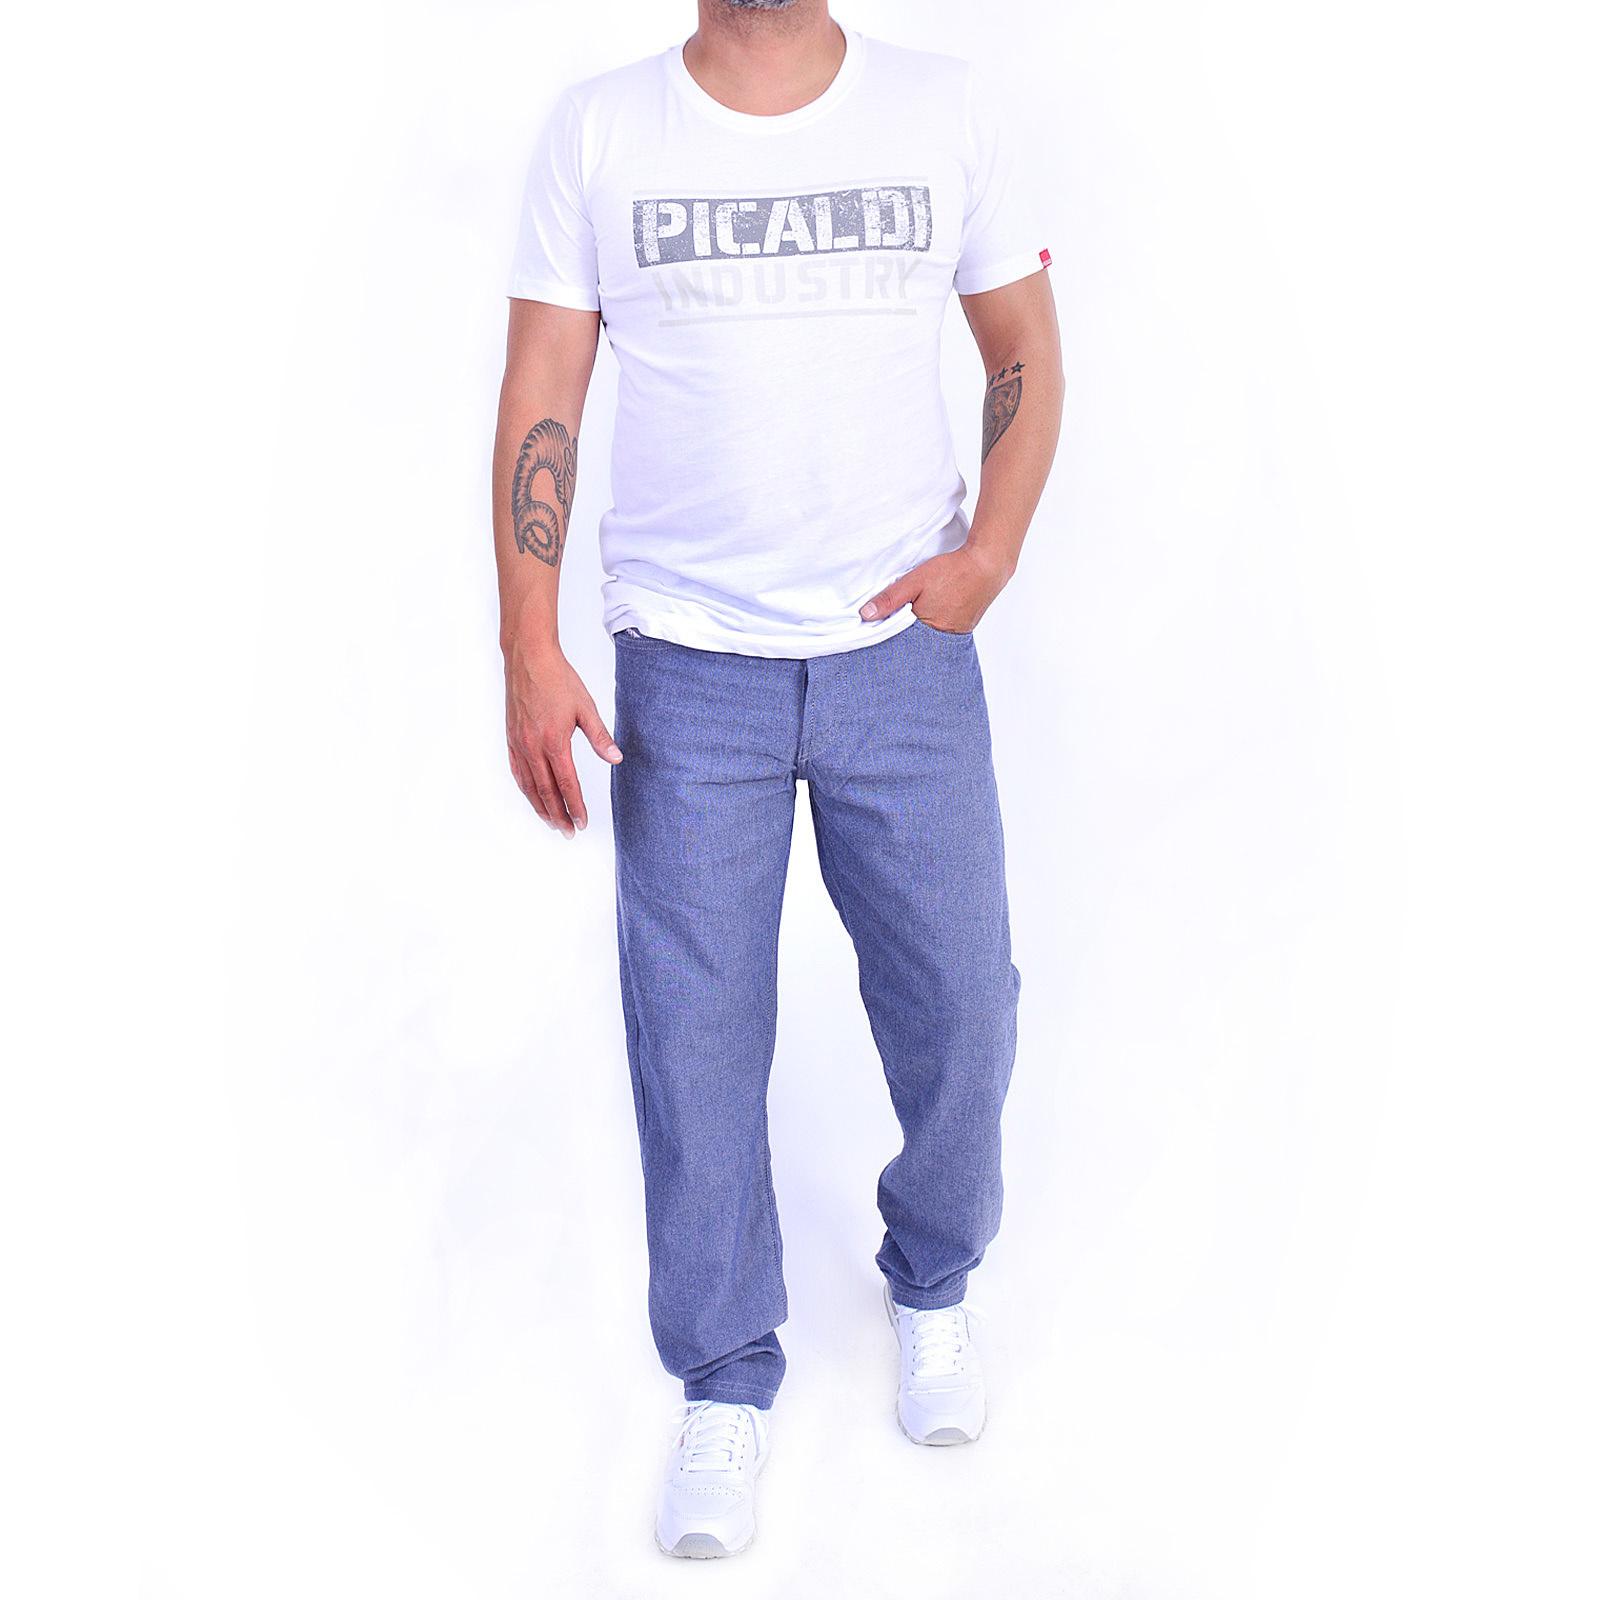 Picaldi New Zicco 473 Jeans - Island